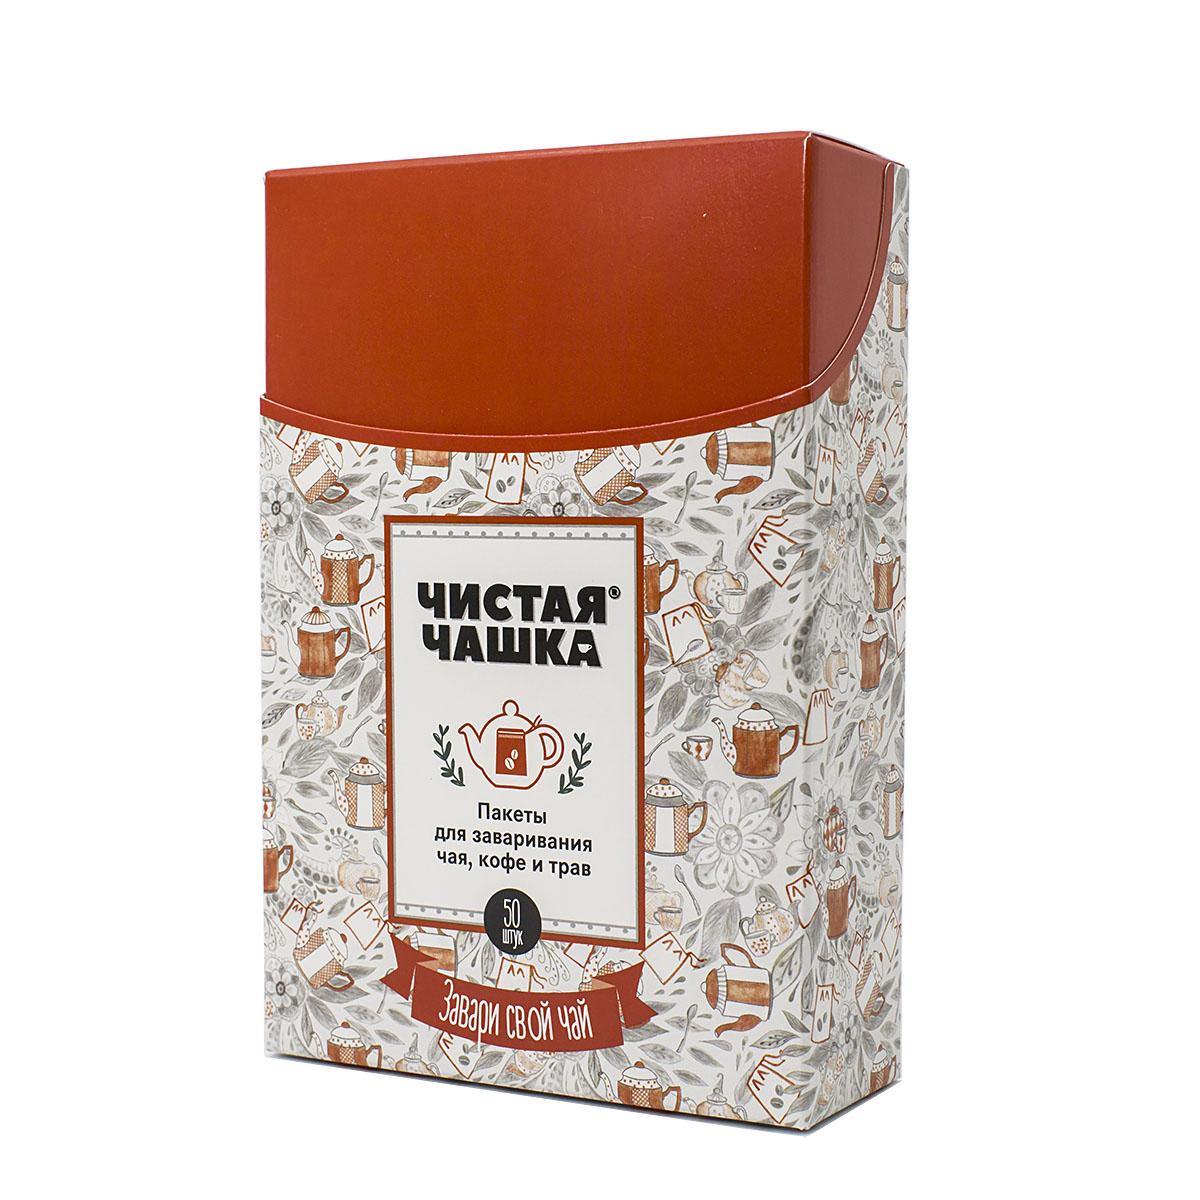 цена на Пакеты для заваривания чая, кофе, трав Чистая чашка, 10х13 см, 50 шт